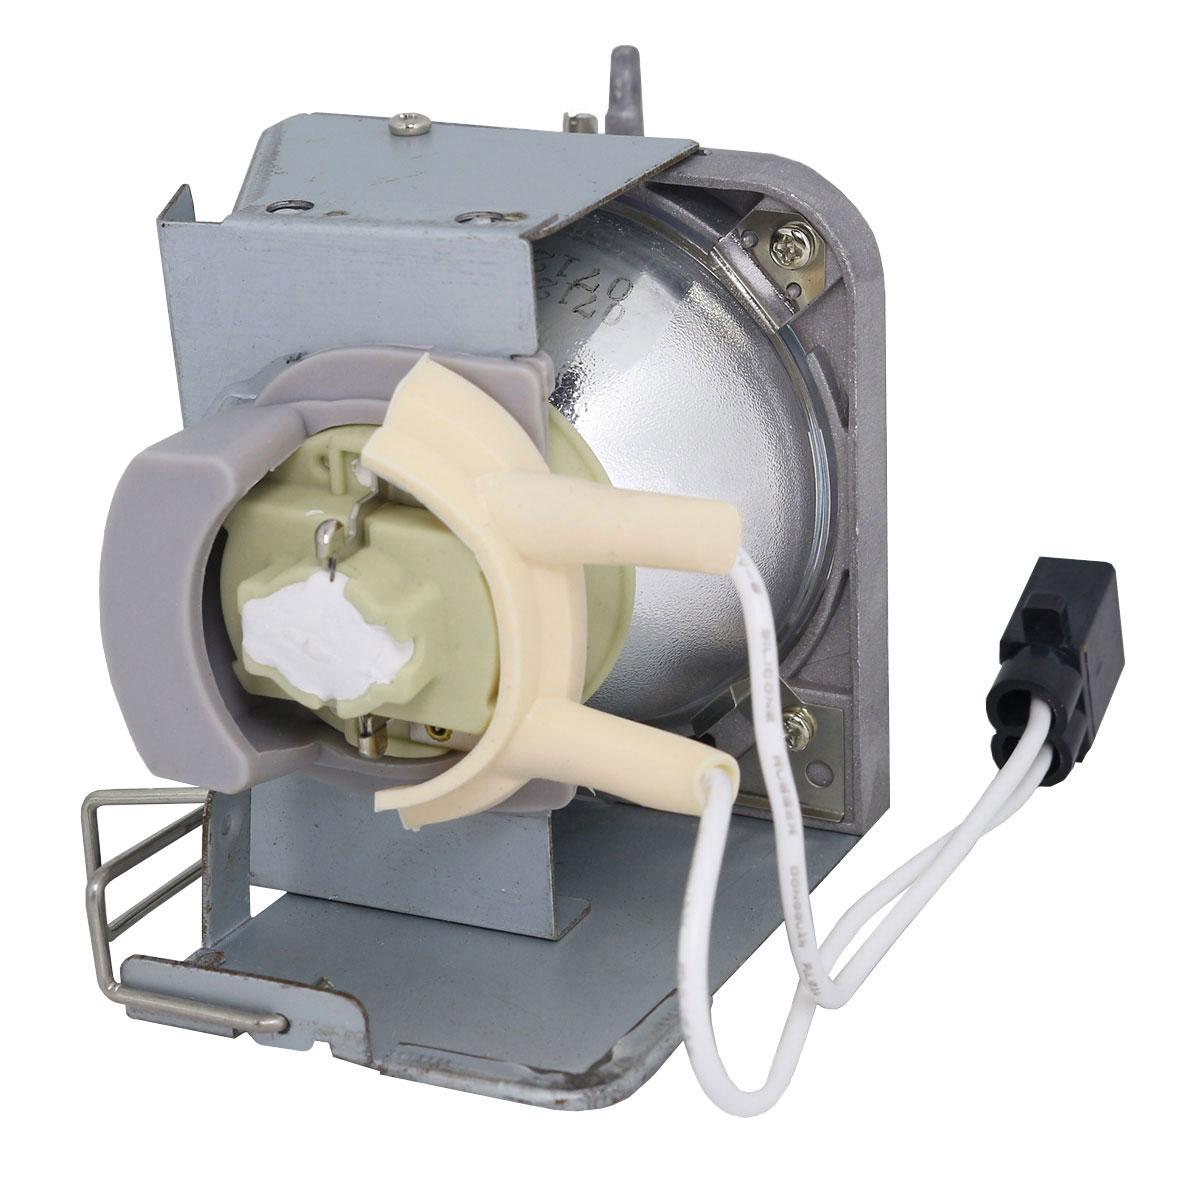 Lutema Platinum for Acer MR.JJU11.002 Projector Lamp (Original Philips Bulb) - image 1 de 5